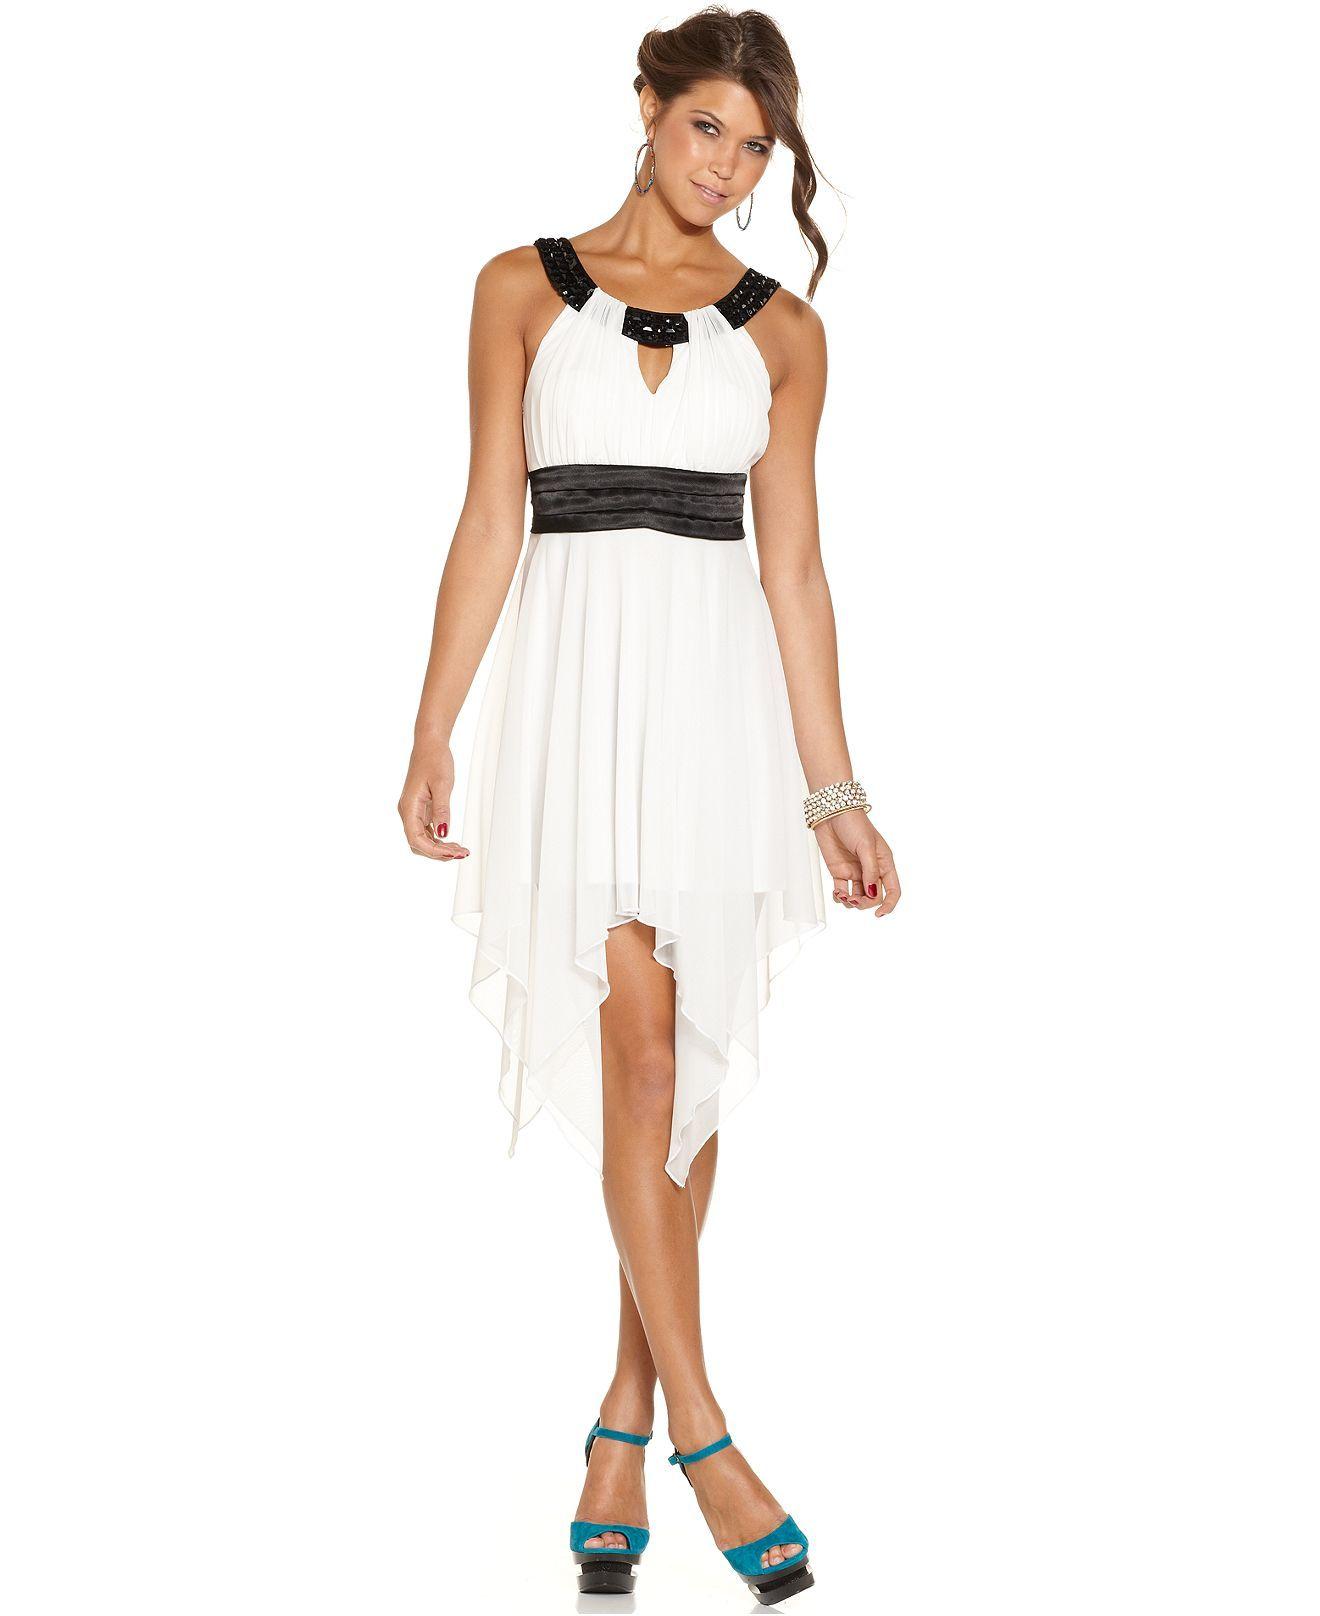 Trixxi Juniors Dress, Sleeveless Studded Handkerchief-Hem - Juniors Dresses - Macy's